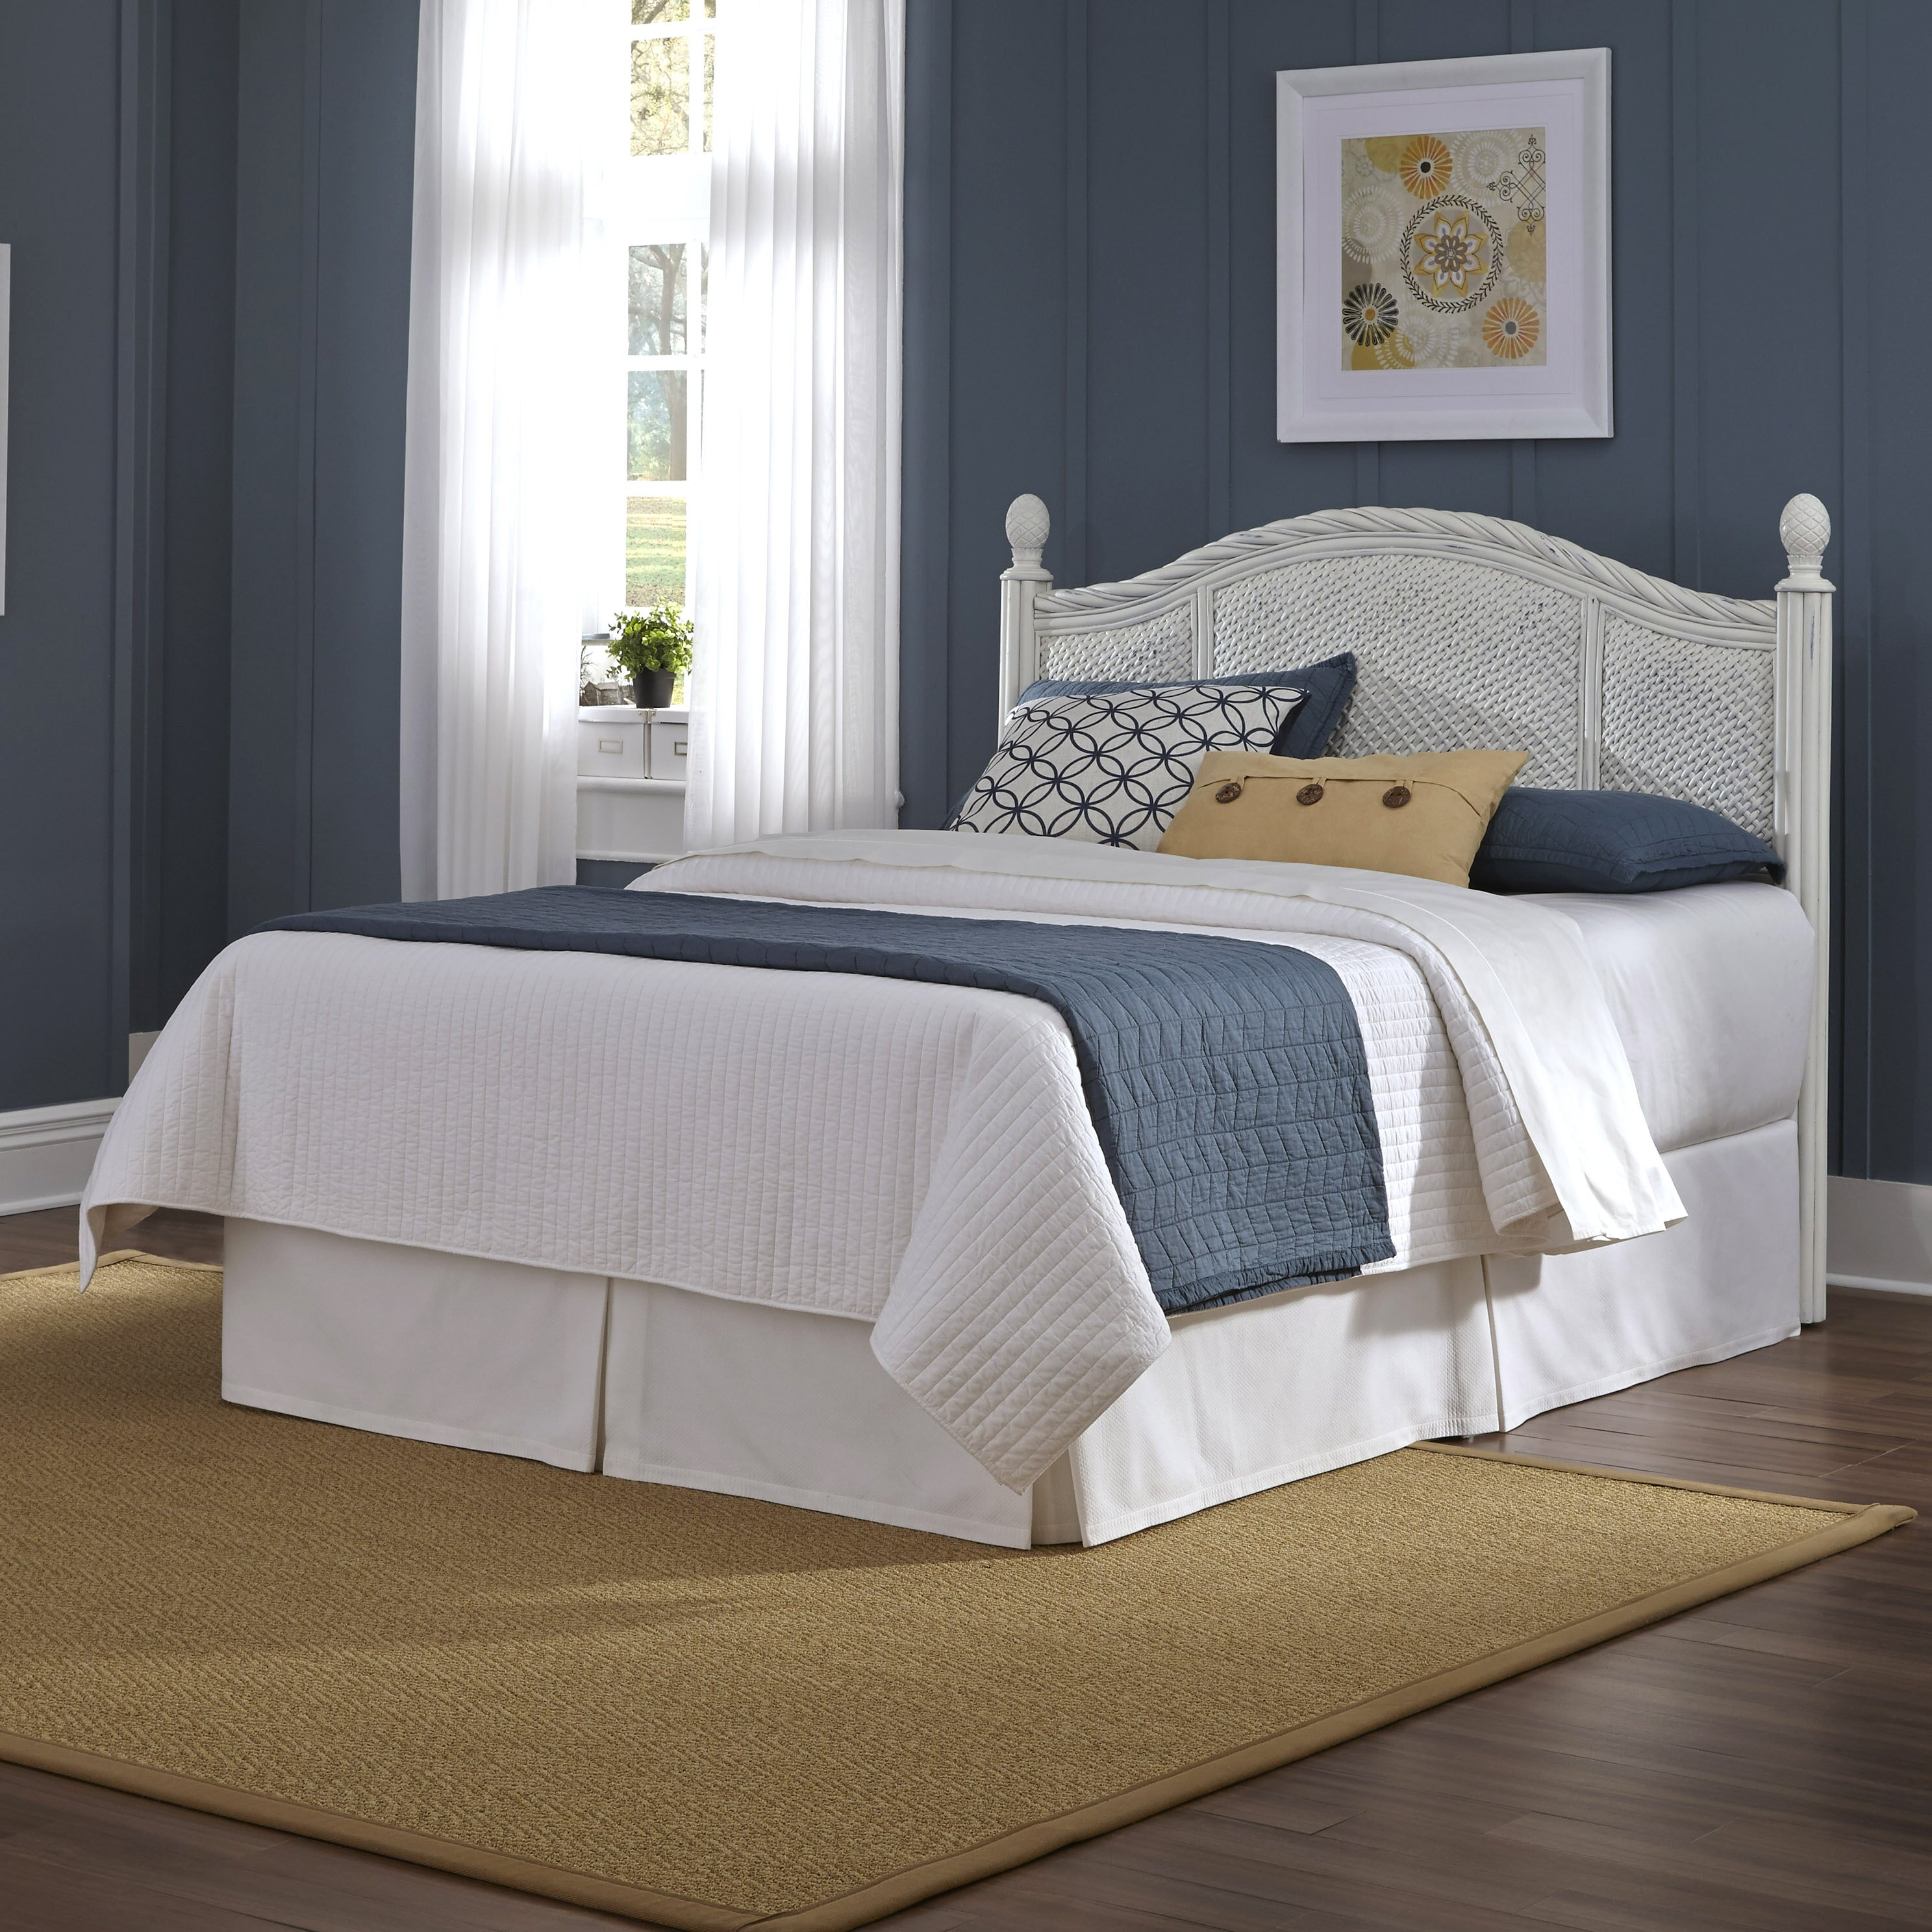 Bay isle home oliver wicker headboard reviews wayfair for Rattan bedroom furniture